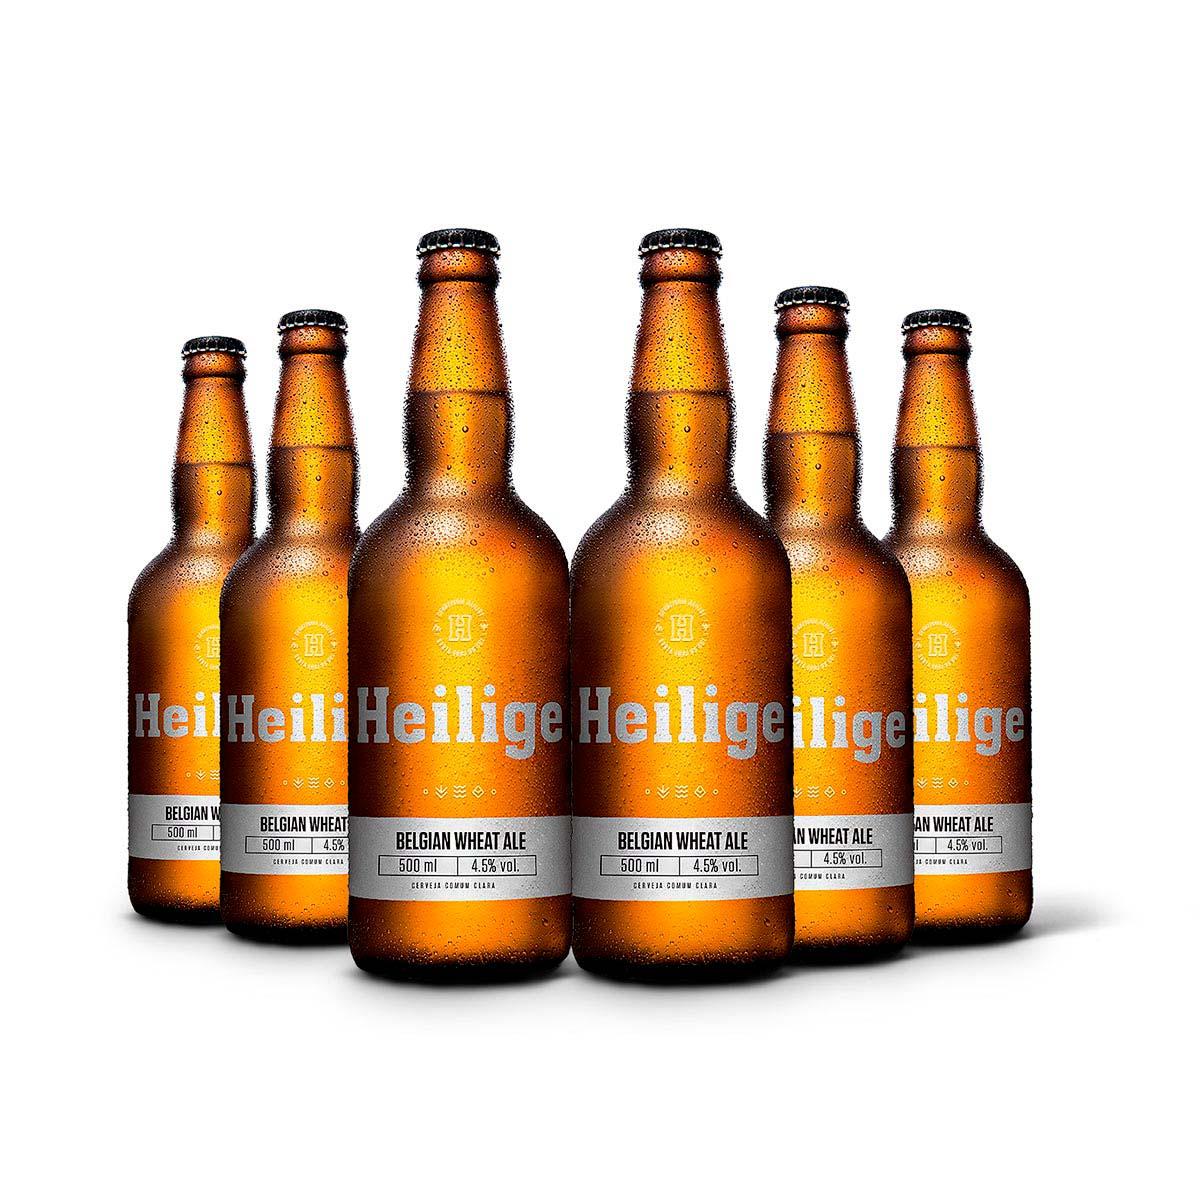 Pack Heilige Belgian Wheat Ale 6 cervejas 500ml